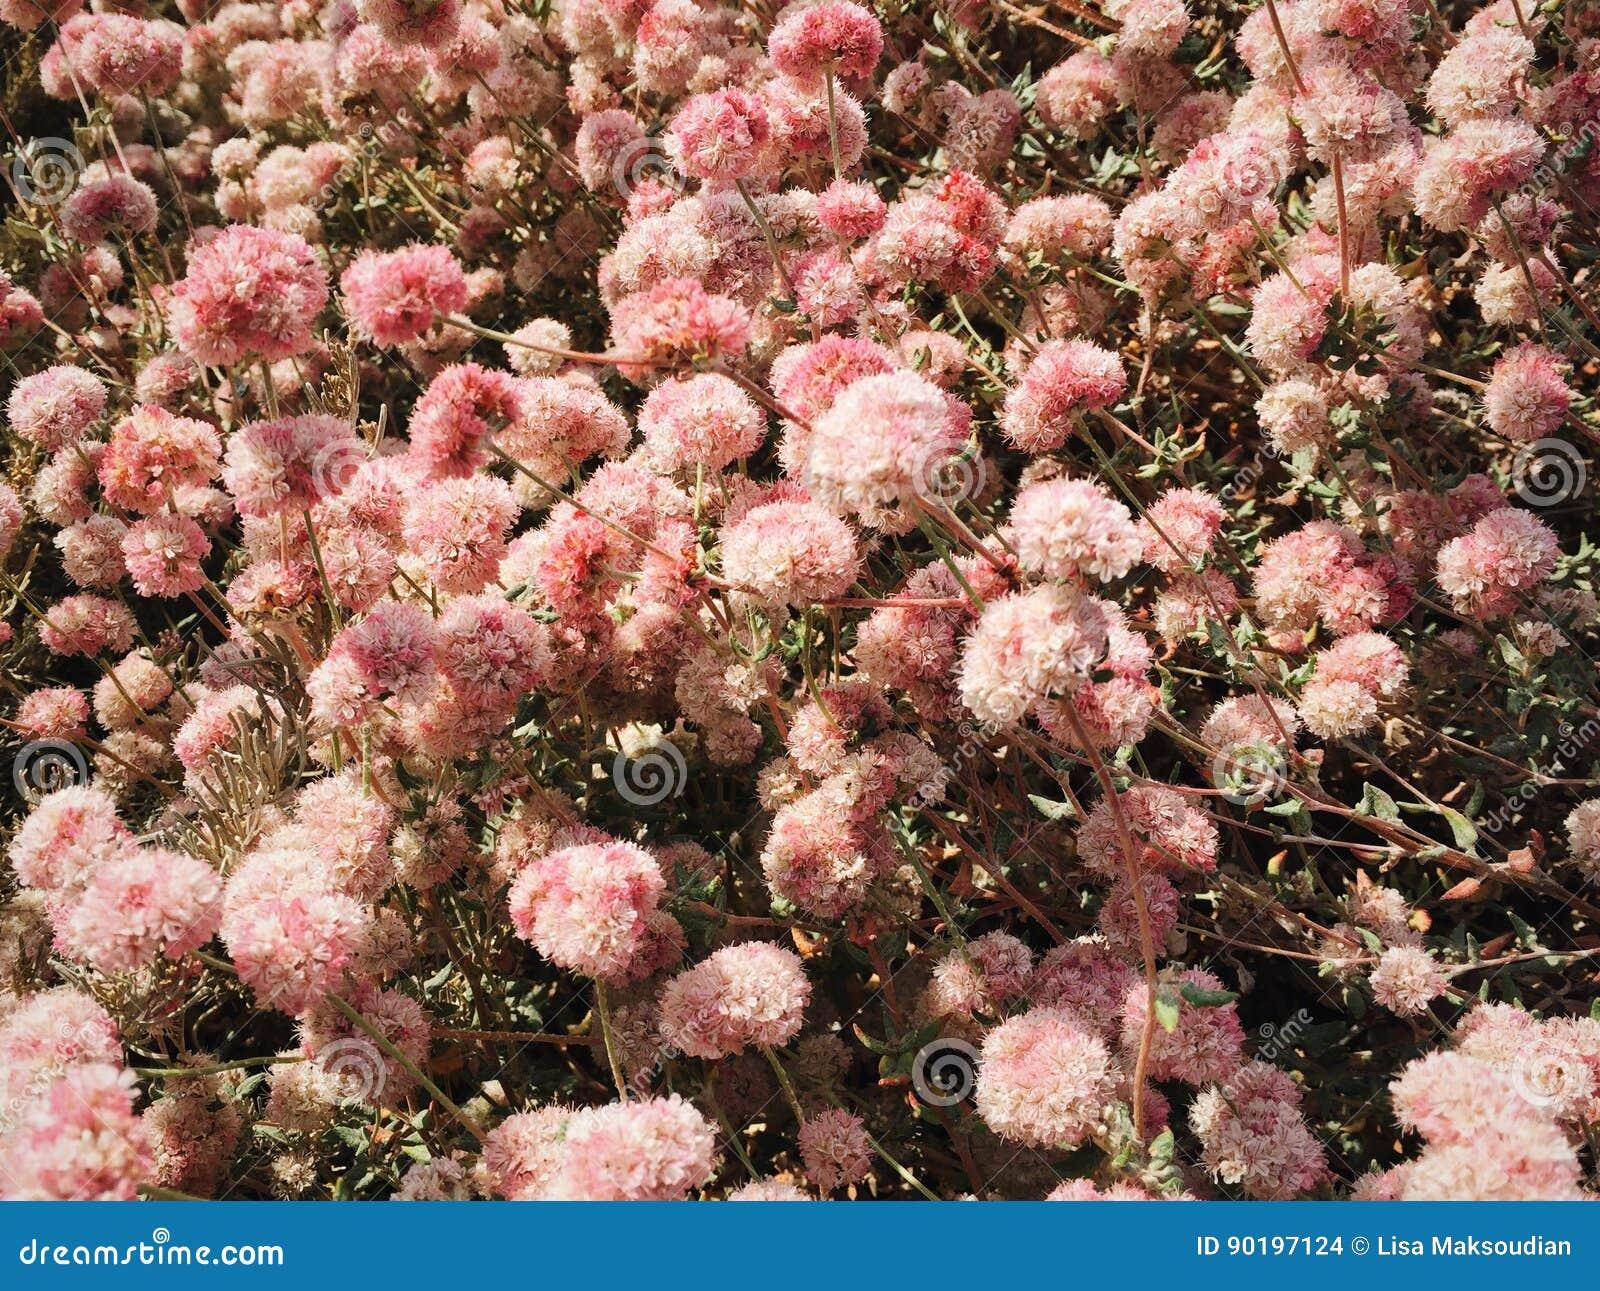 Round Pink Arid Flowers Stock Photo Image Of Flower 90197124